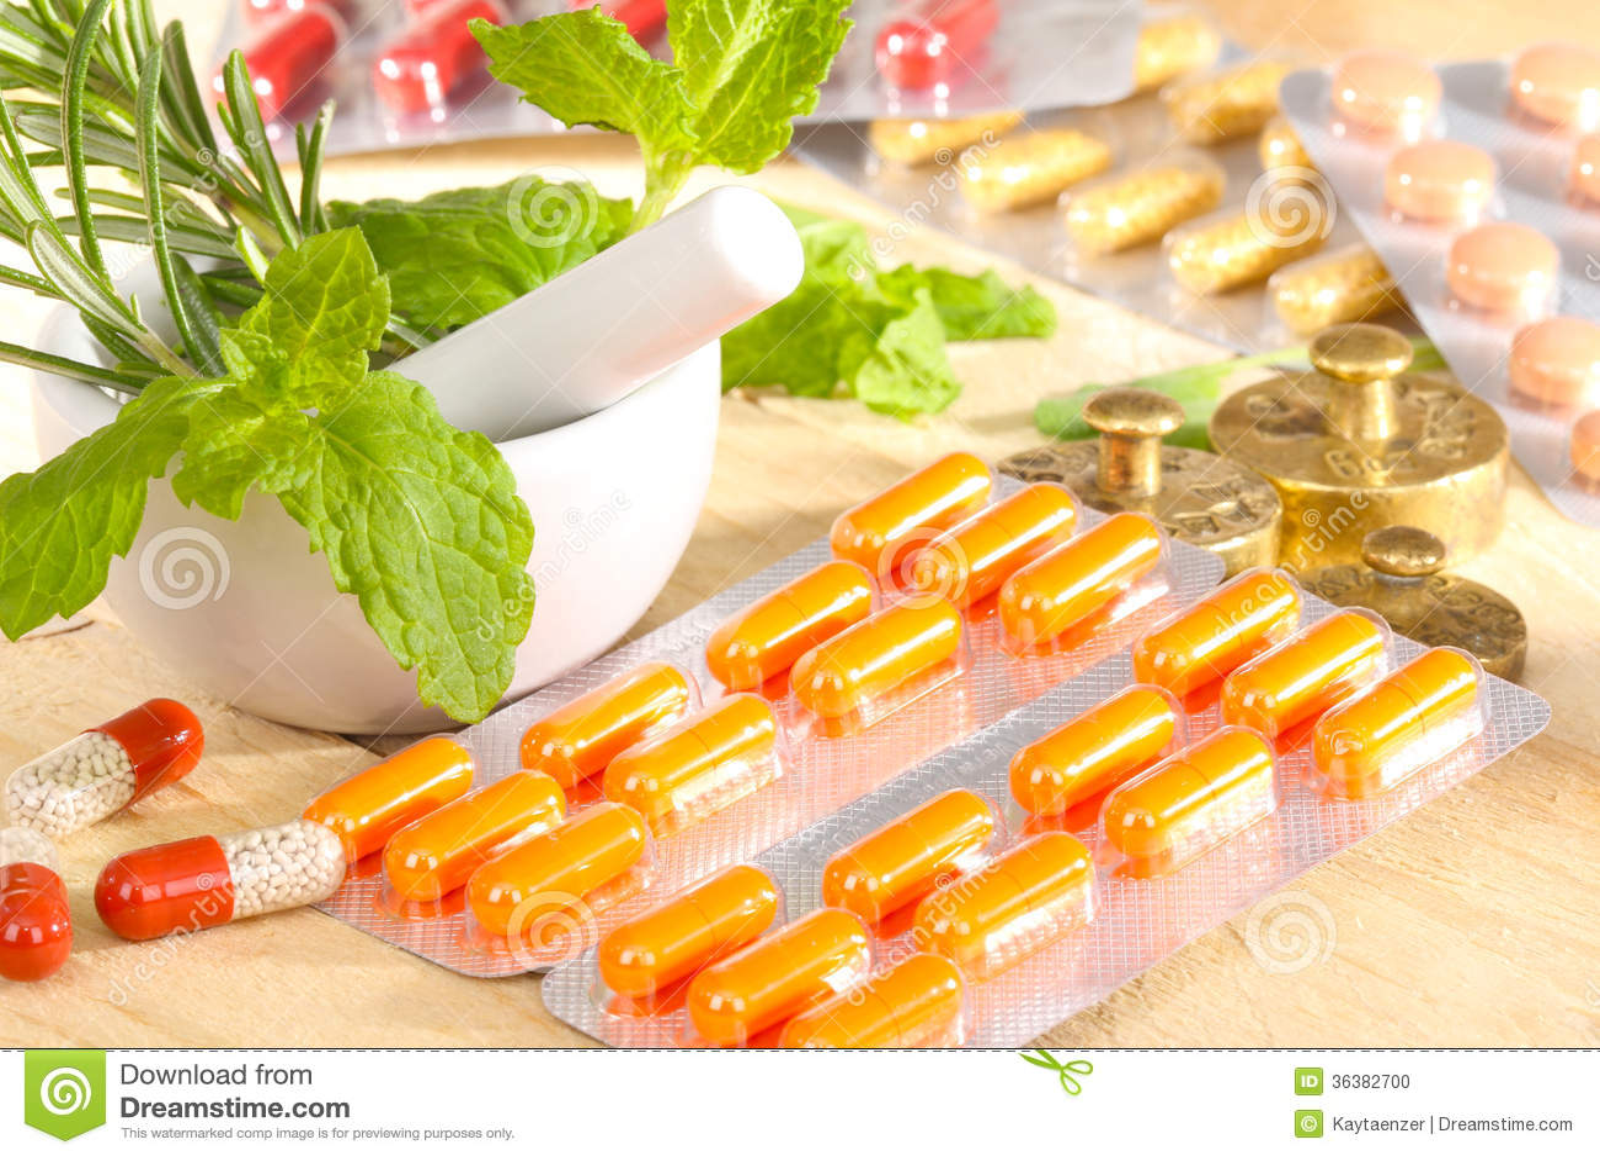 Conventional Medicine And Alternative Medicine Stock Photo